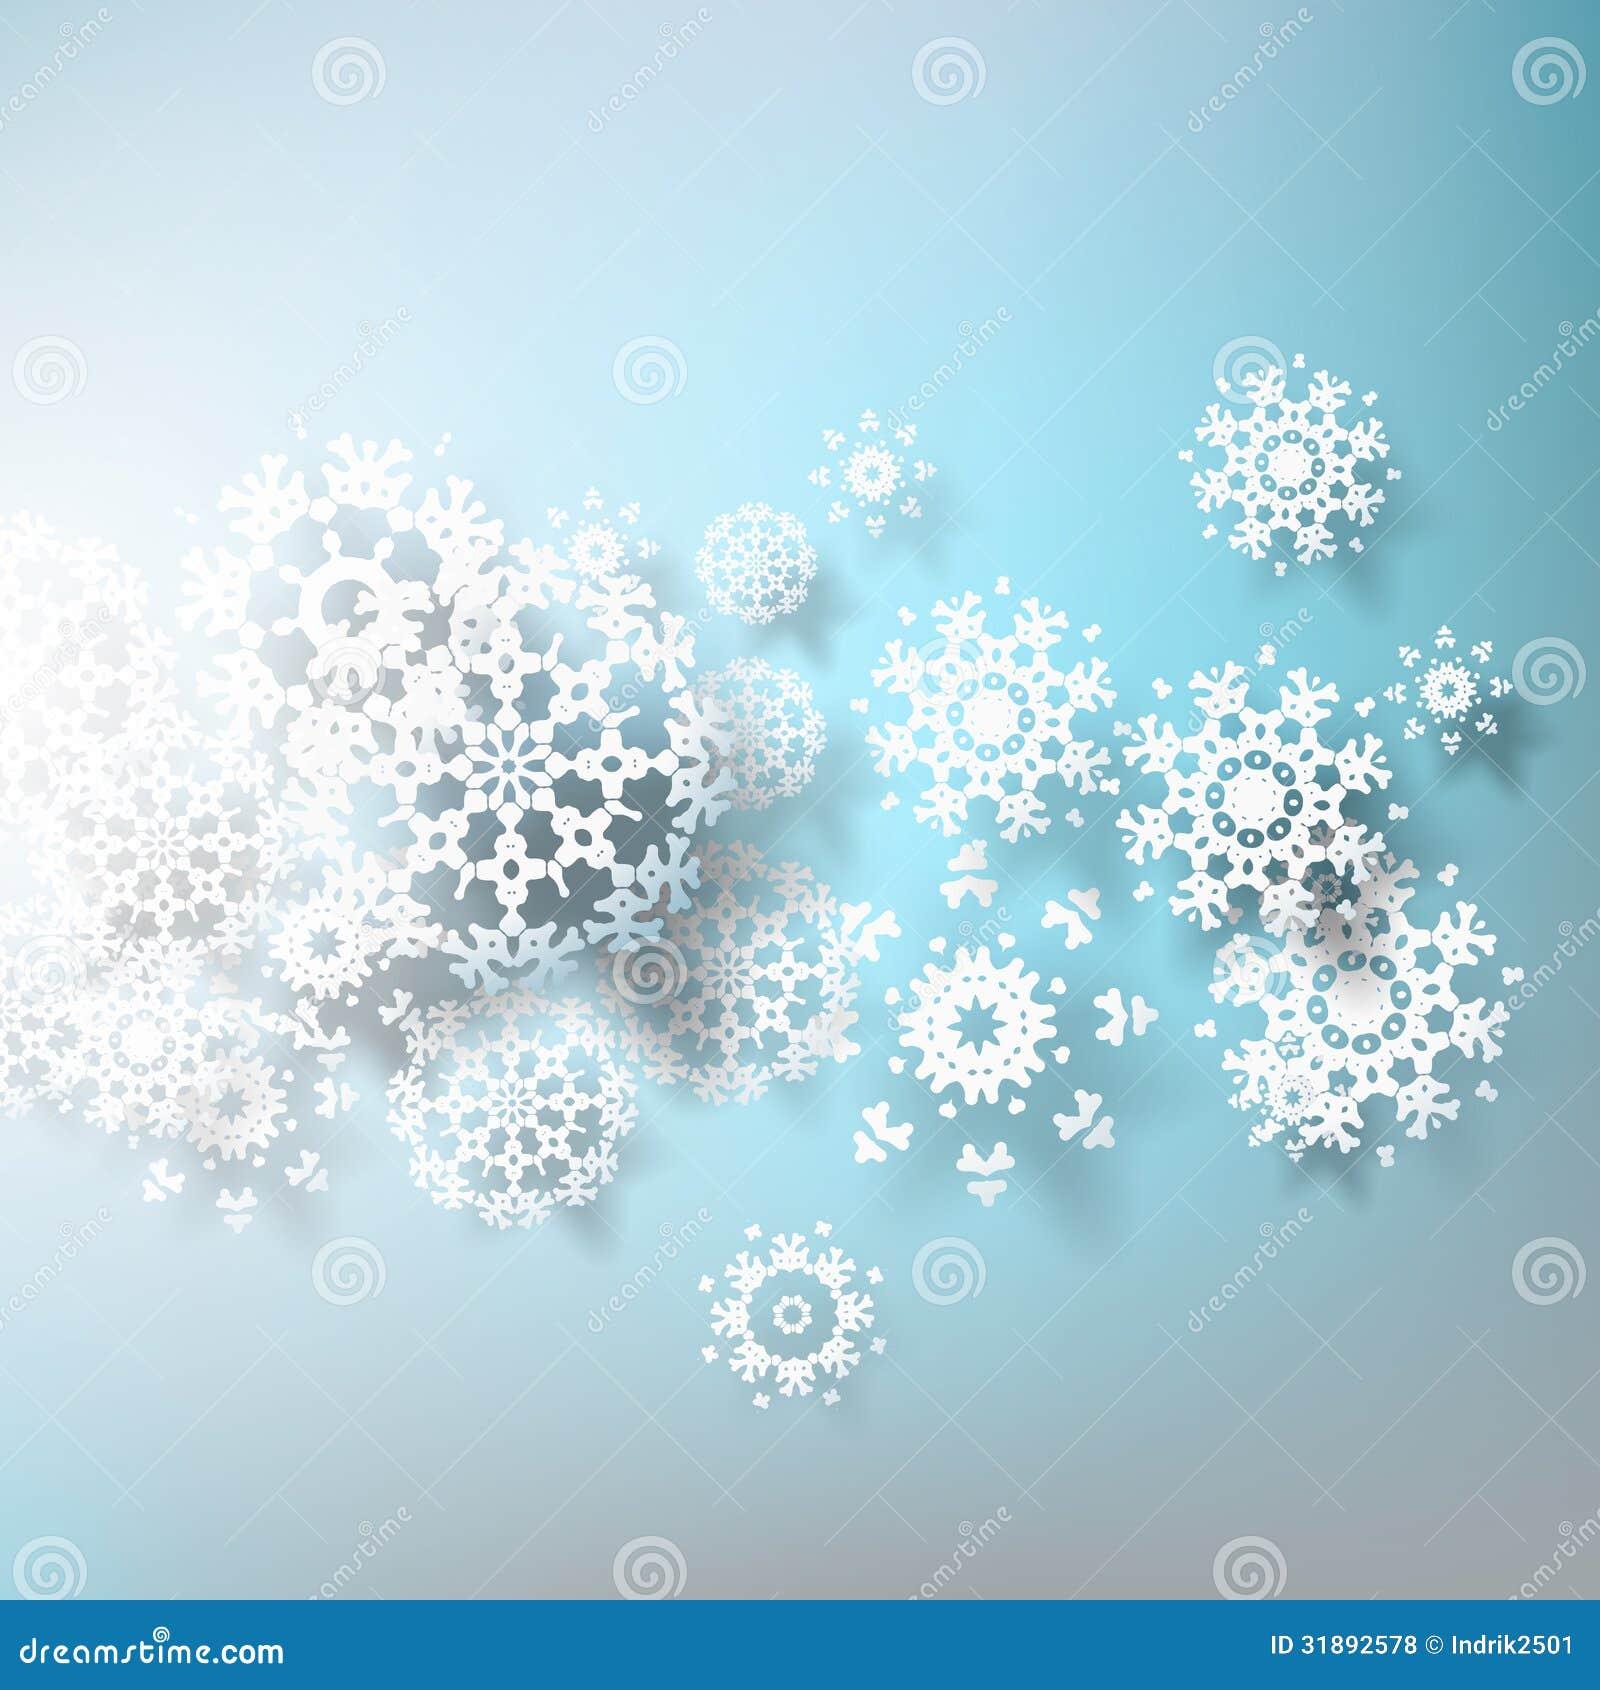 3d Snowflake Template Printable 3d snowflake template.